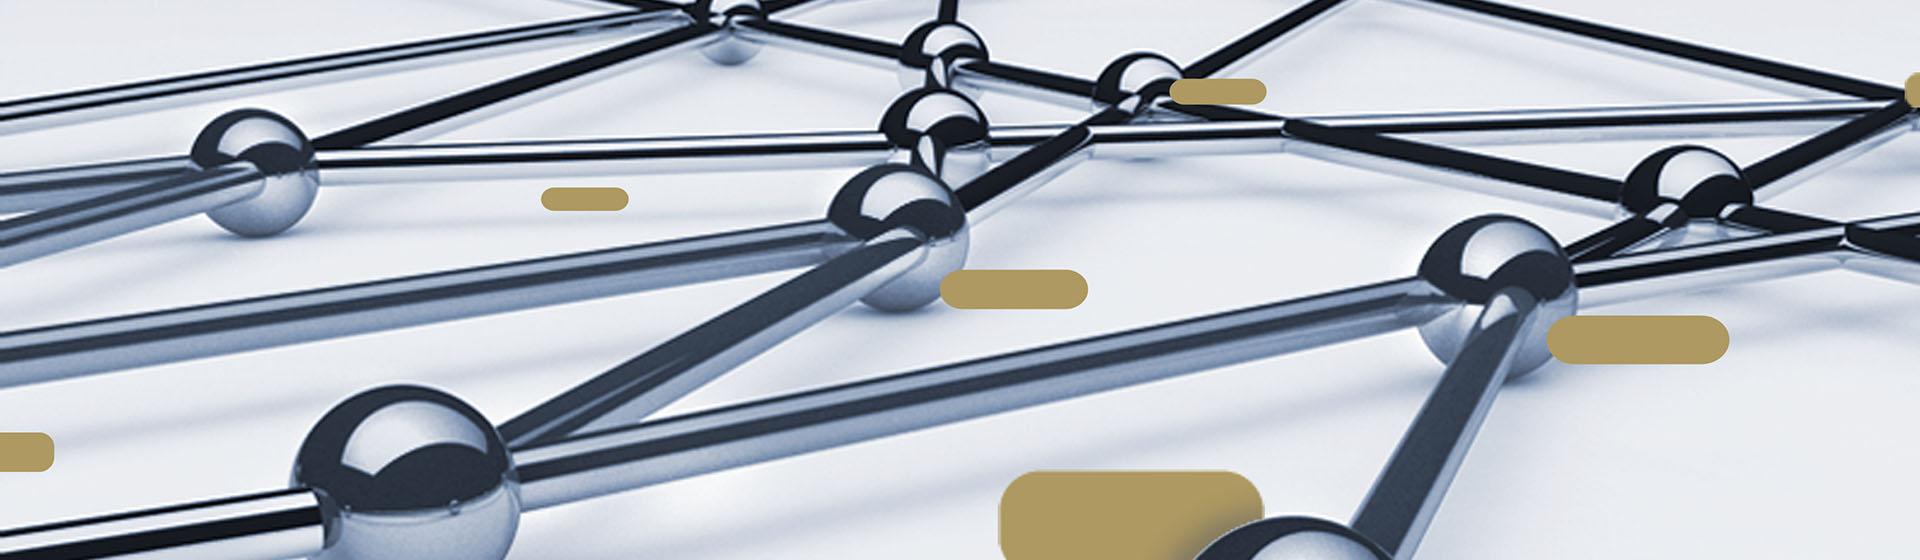 Schulte Bender & Partner | Die Value Chain Berater | SBP